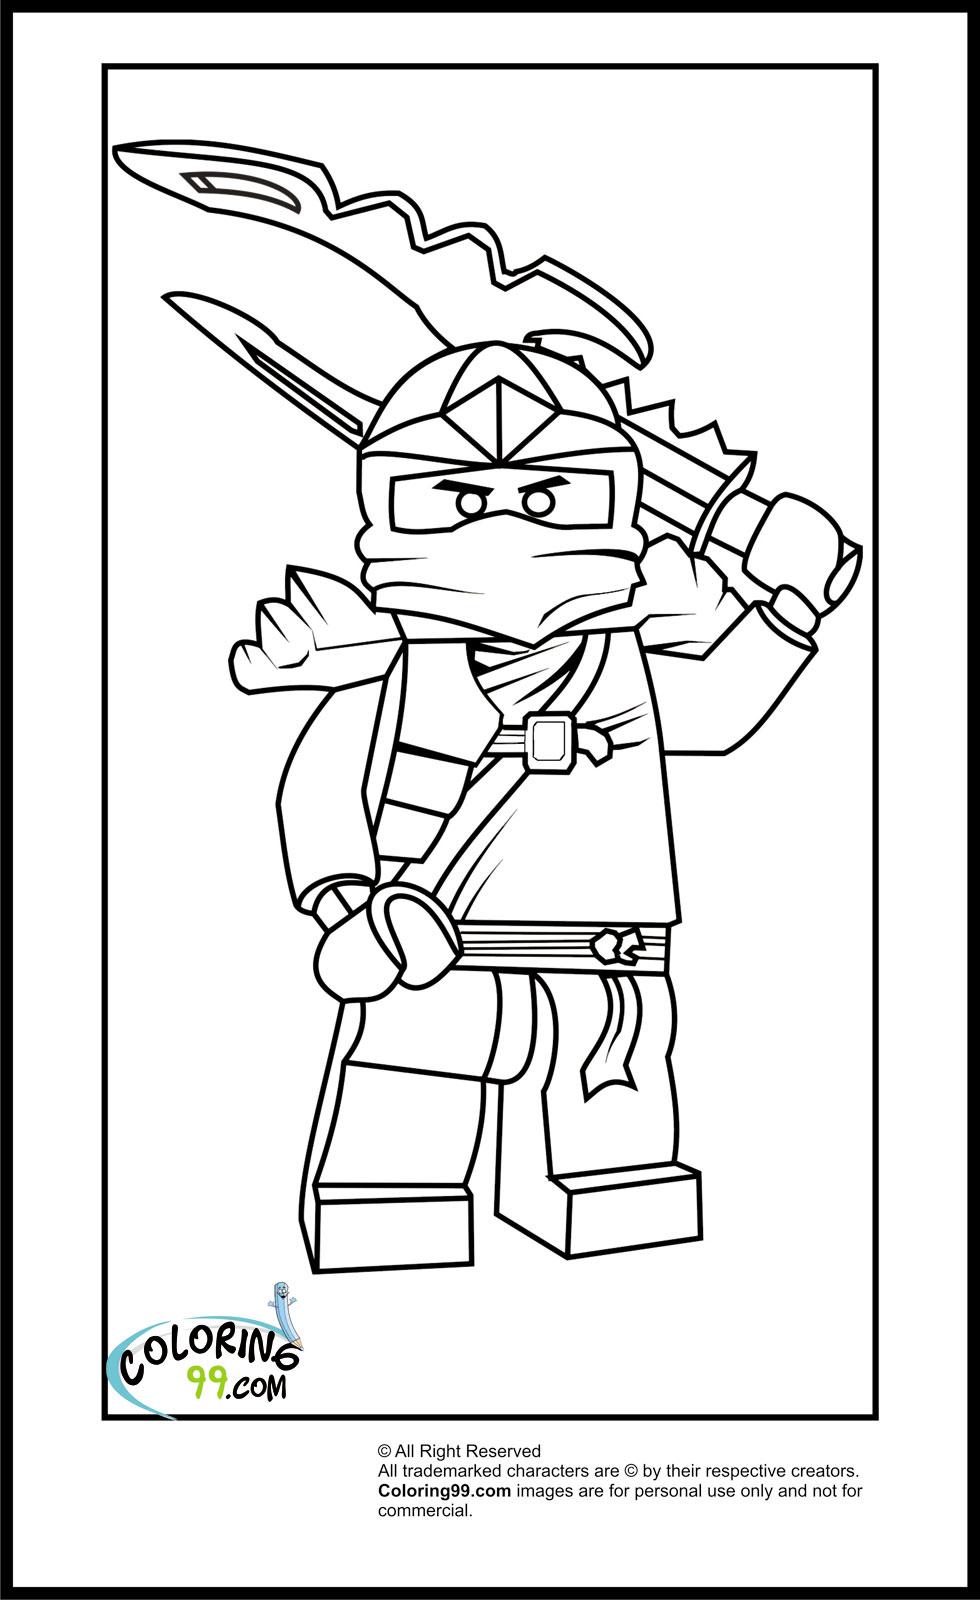 Lego ninjago masters of spinjitzu jay for Ninjago coloring pages to print